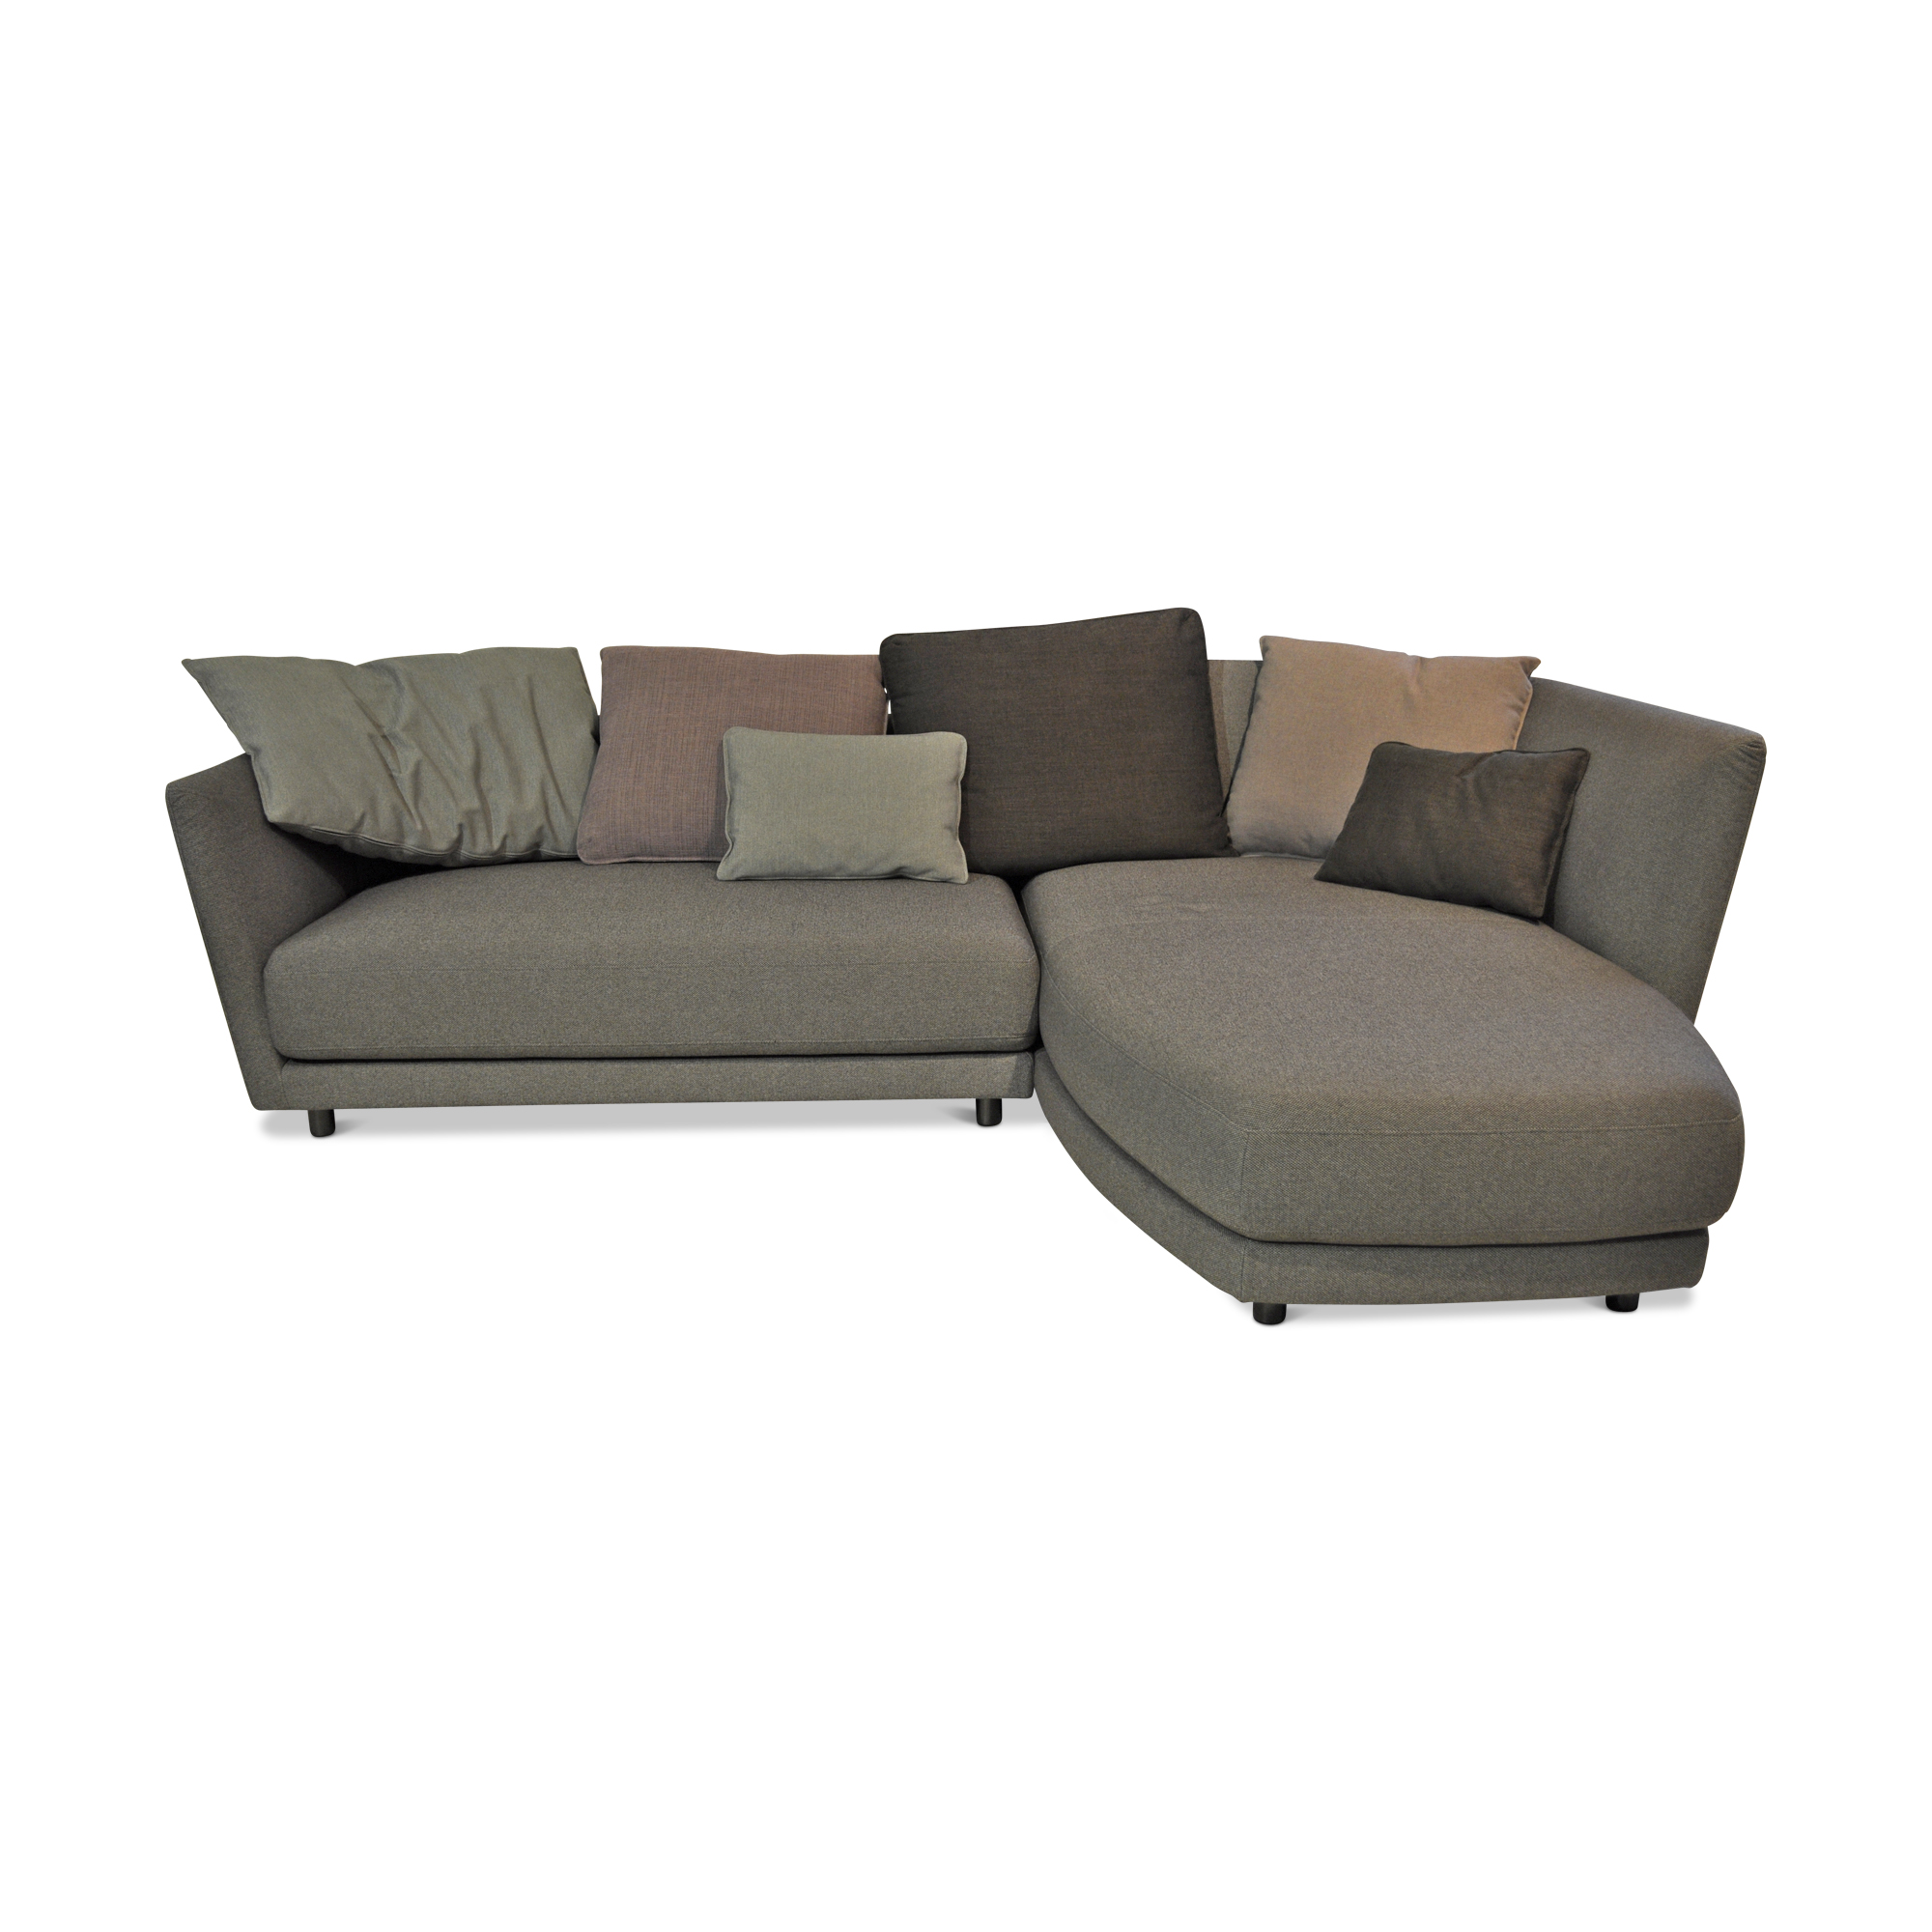 ecksofa tondo 540 rolf benz sofas g nstig kaufen m belfirst. Black Bedroom Furniture Sets. Home Design Ideas